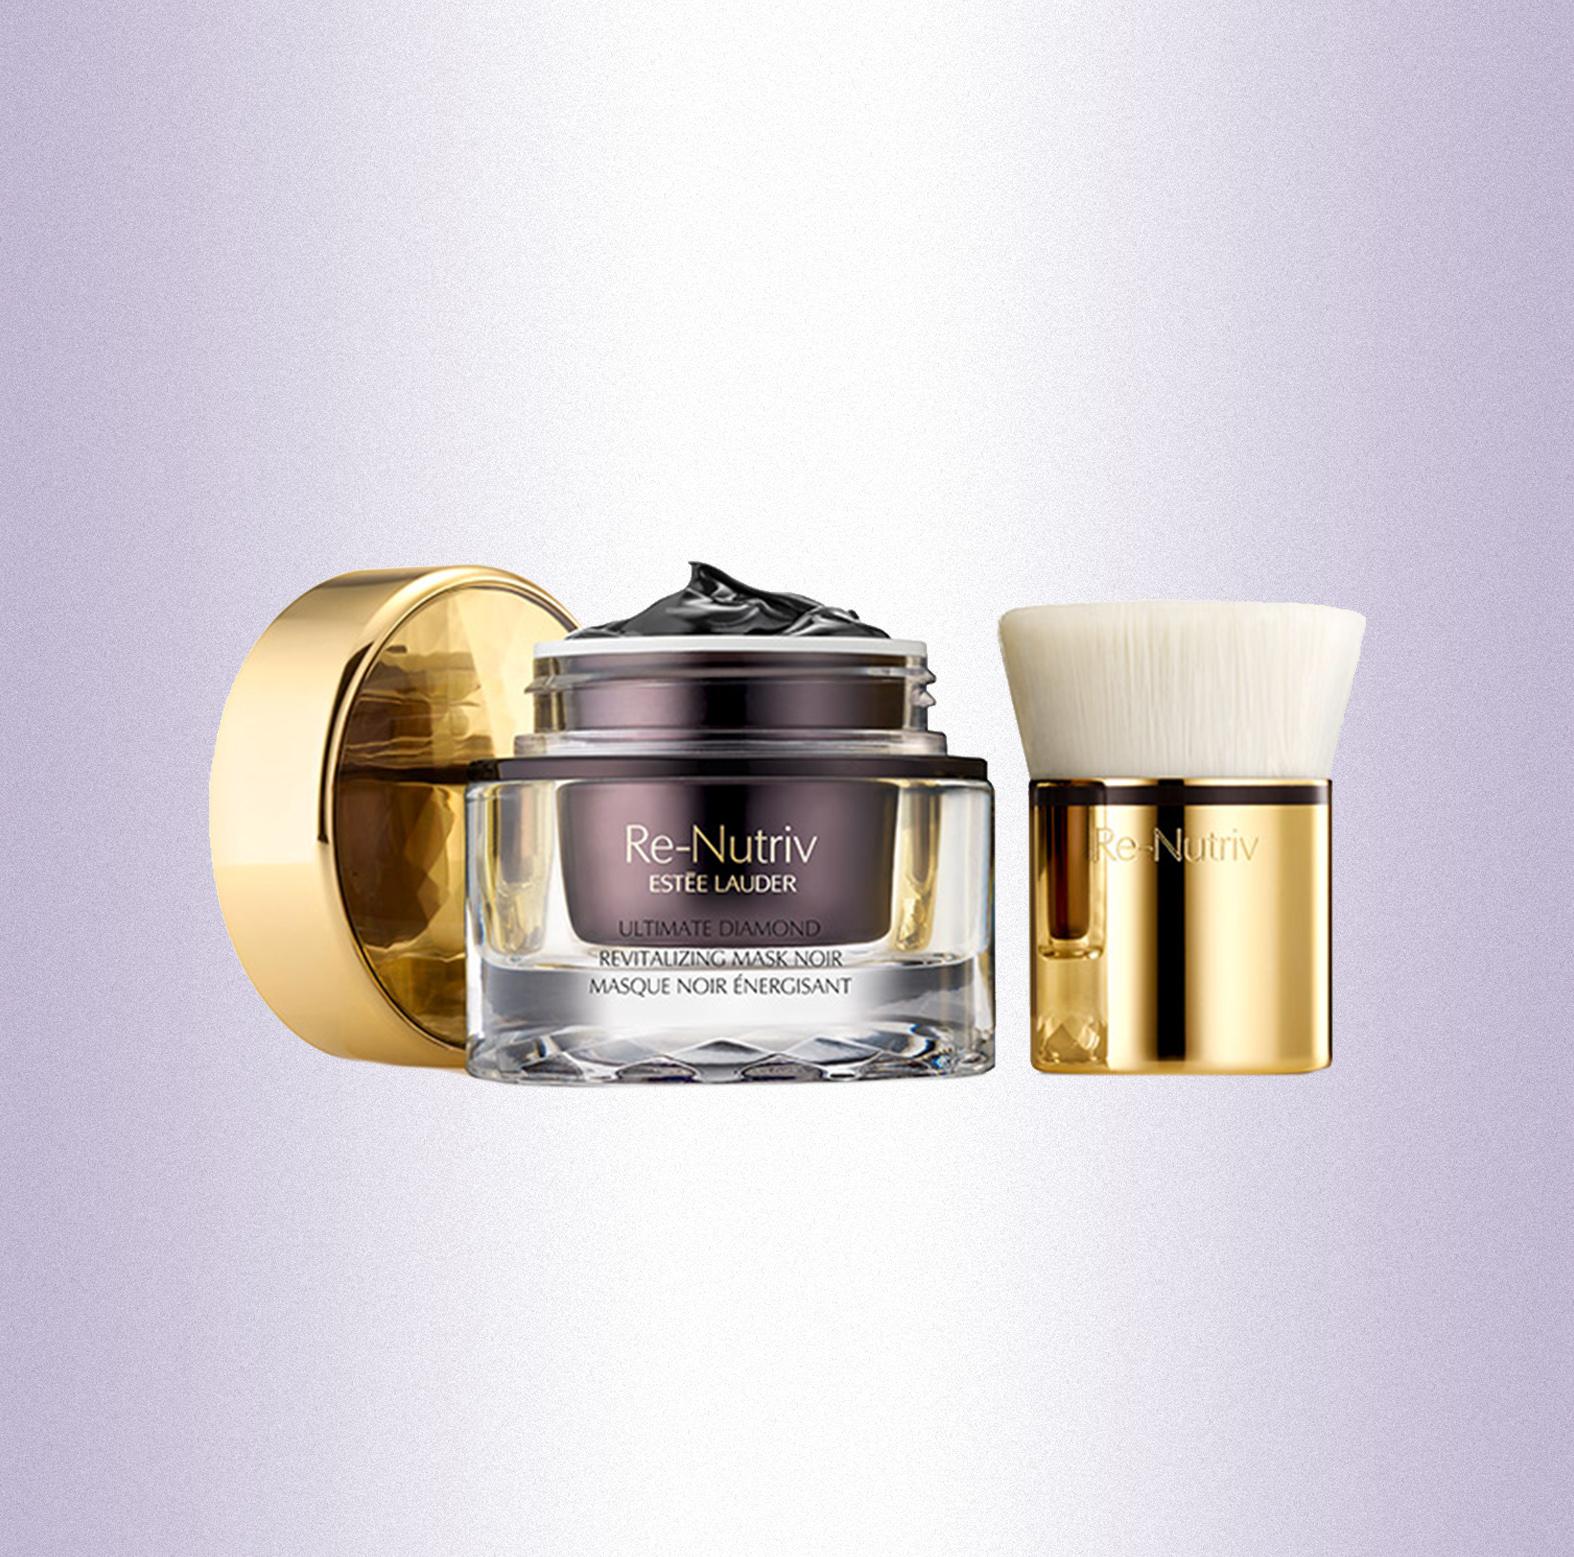 Восстанавливающая маска Re-Nutriv Ultimate Diamond Revitalizing Mask Noir, Estée Lauder